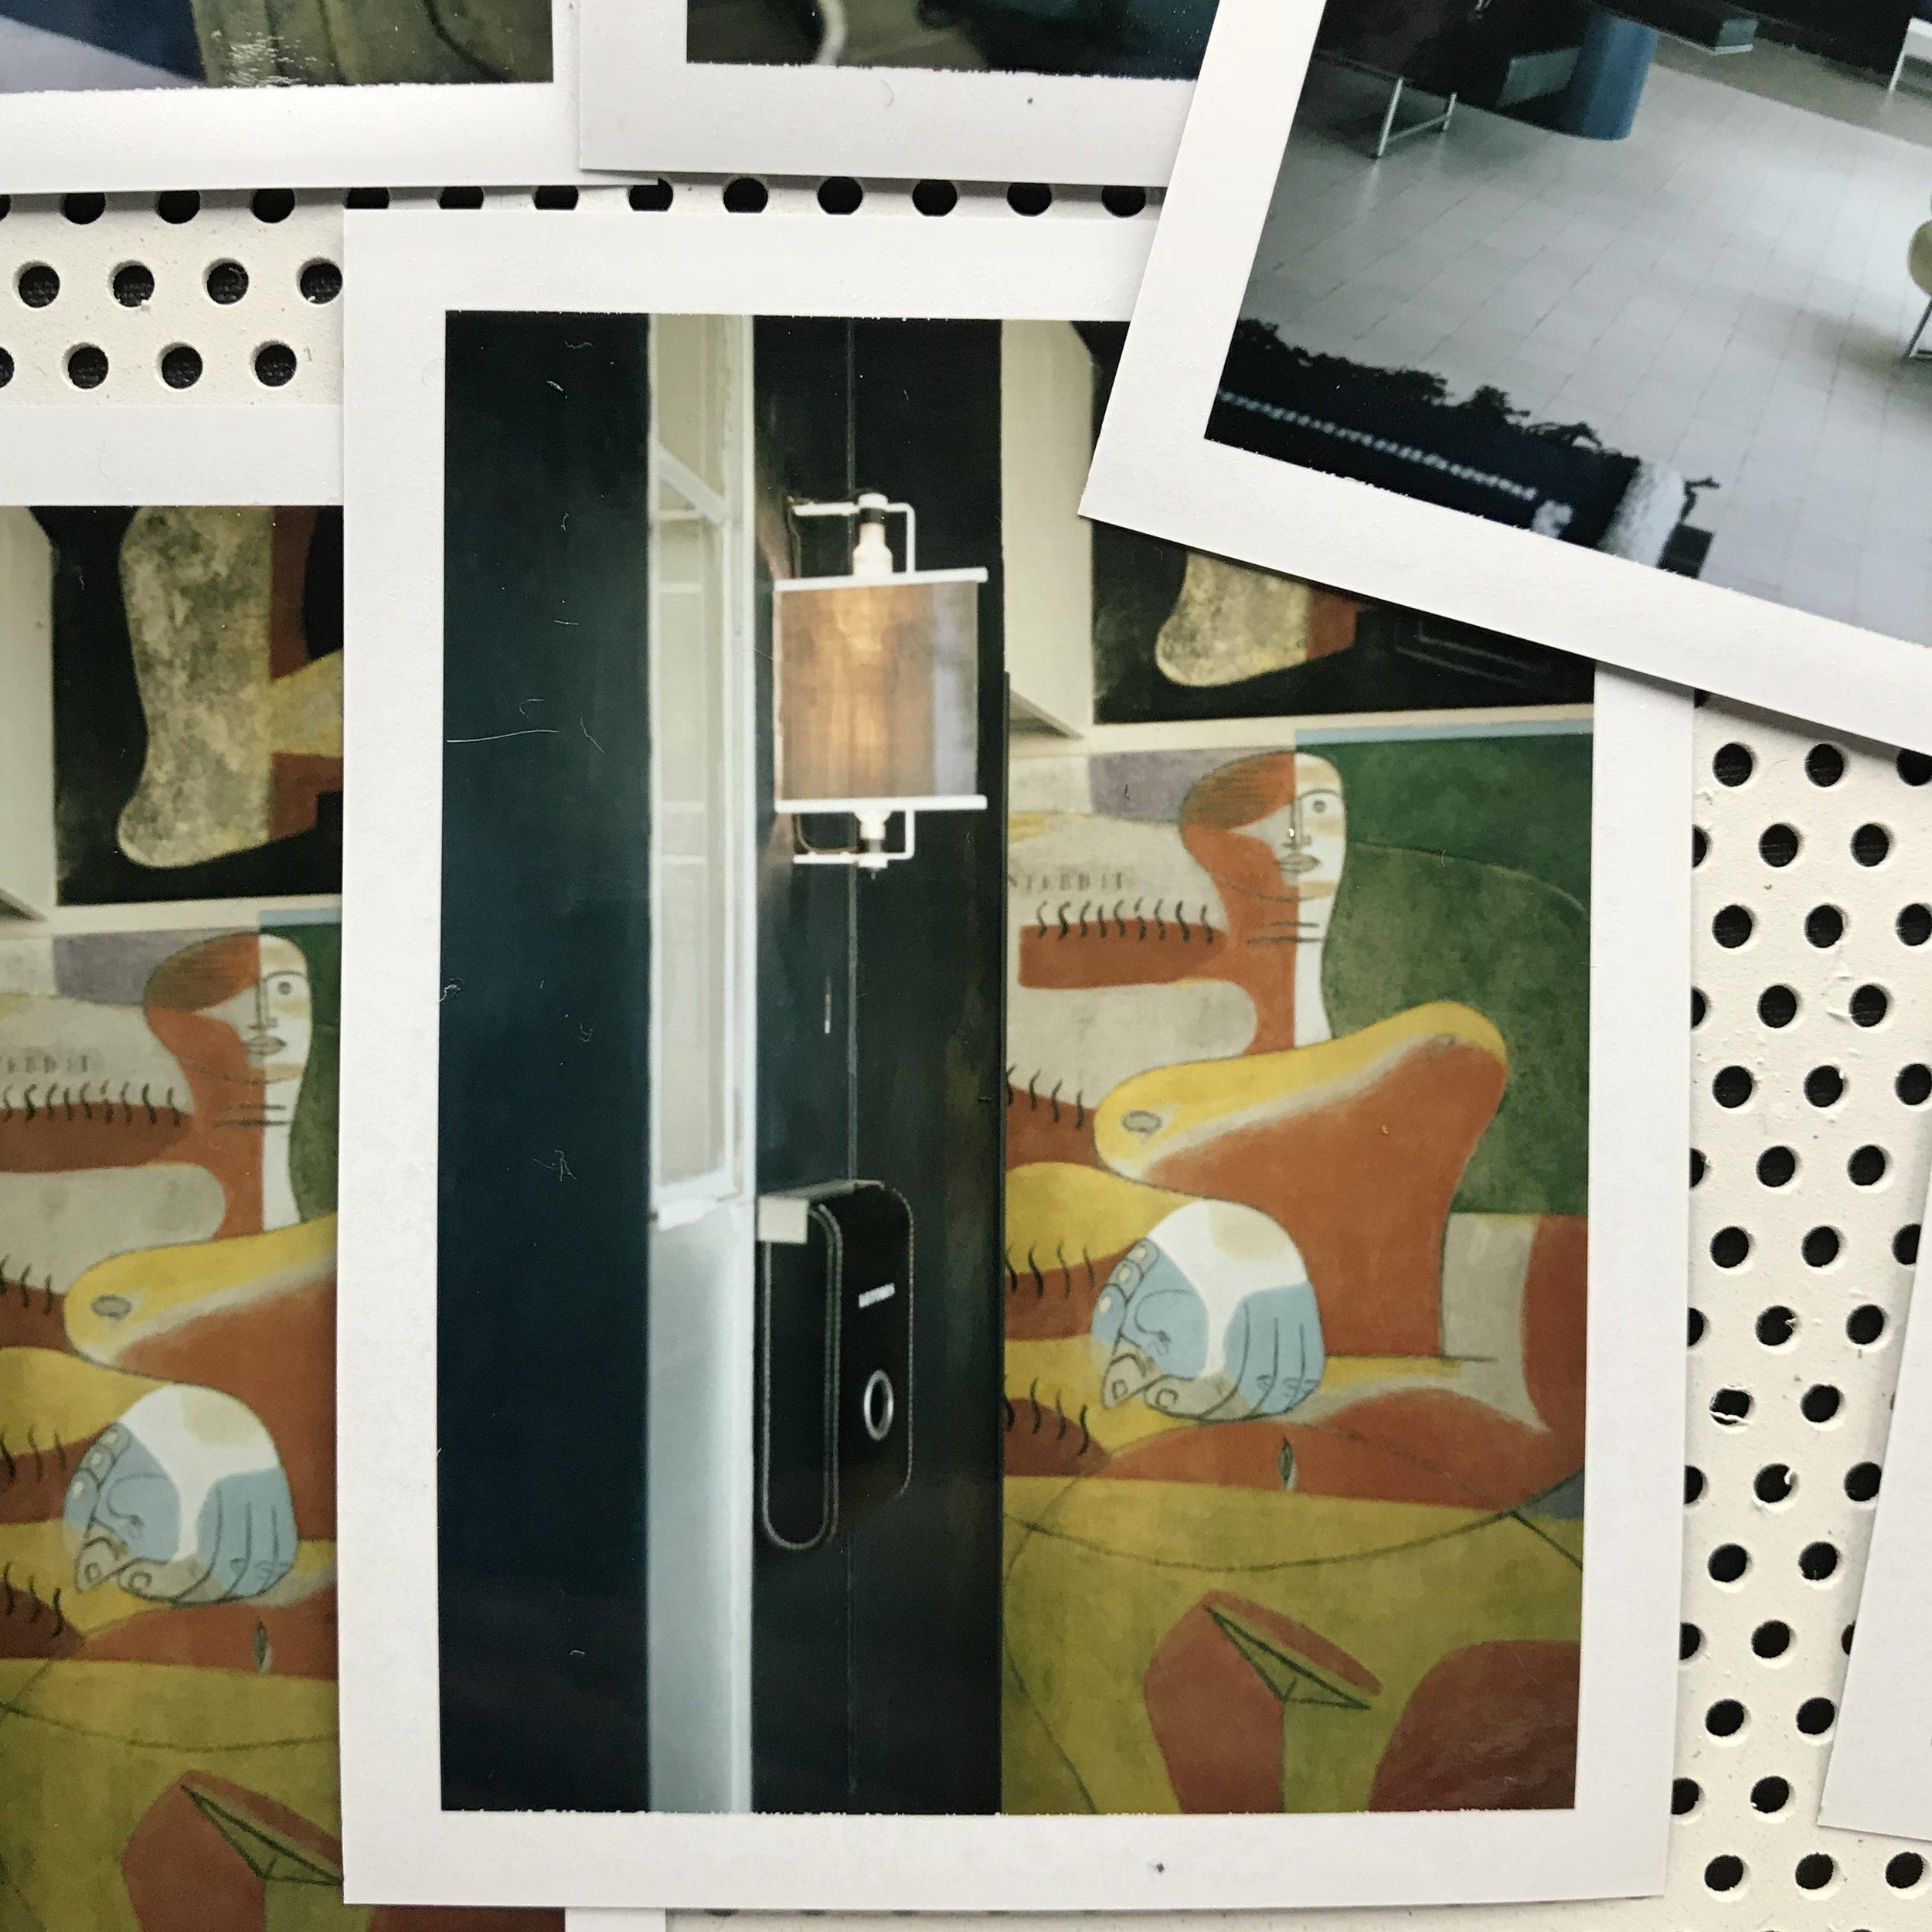 F_Halard Polaroid_E-1027_06.jpg